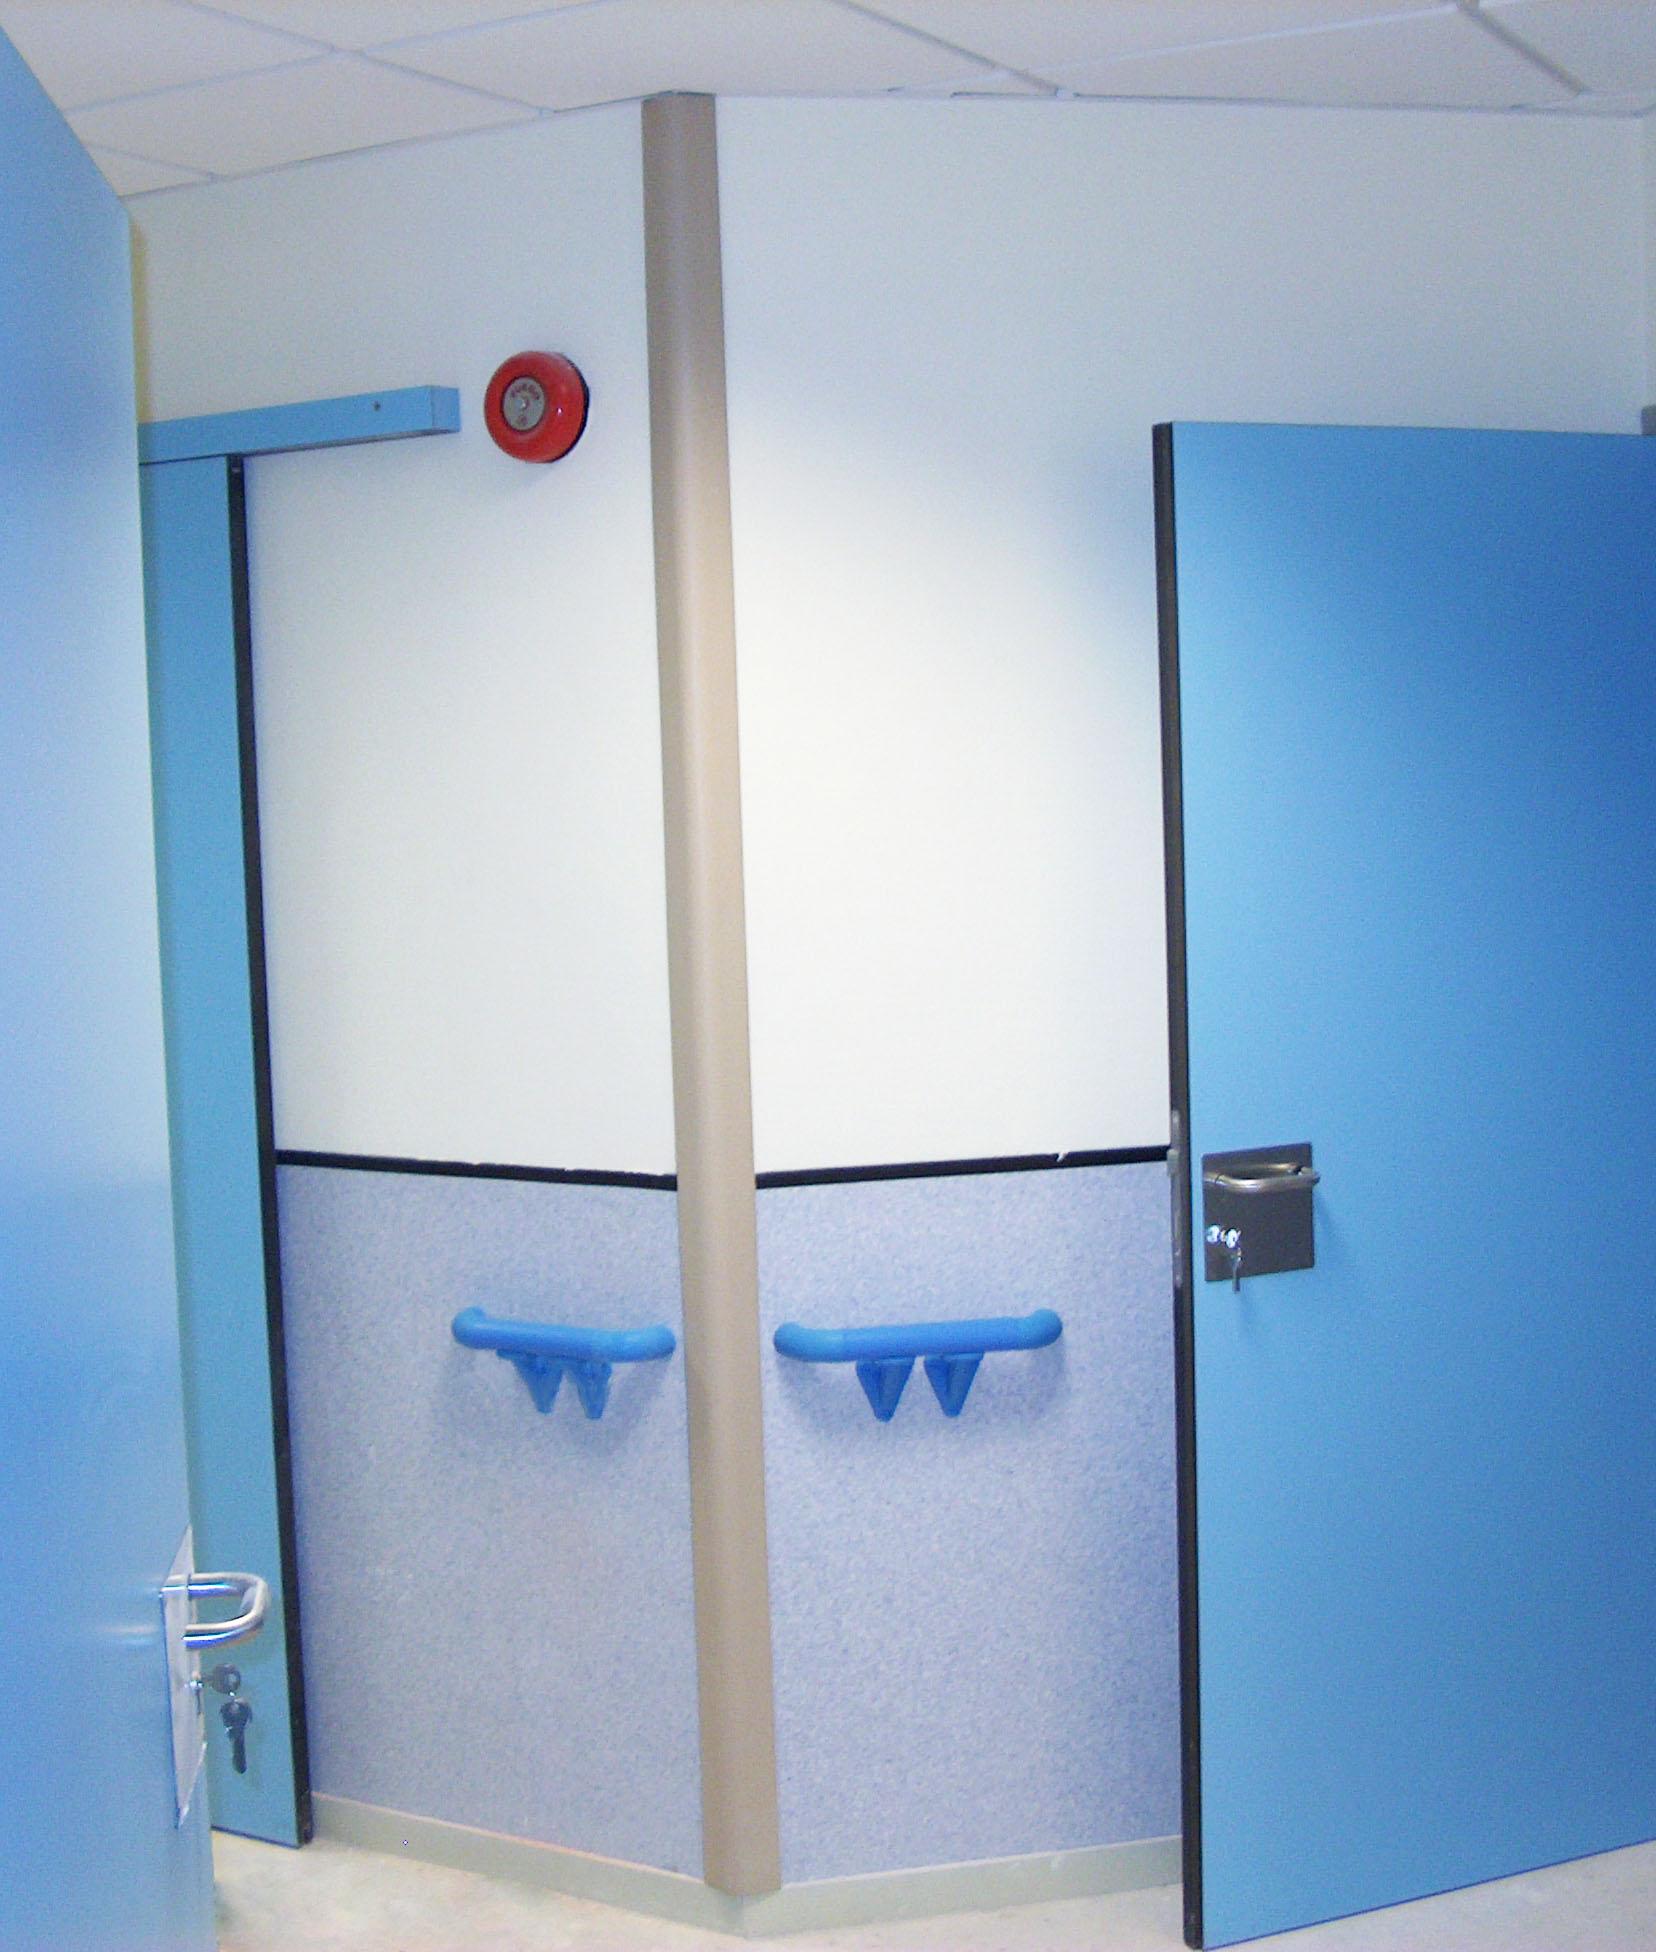 corner-guard-protector-hospital